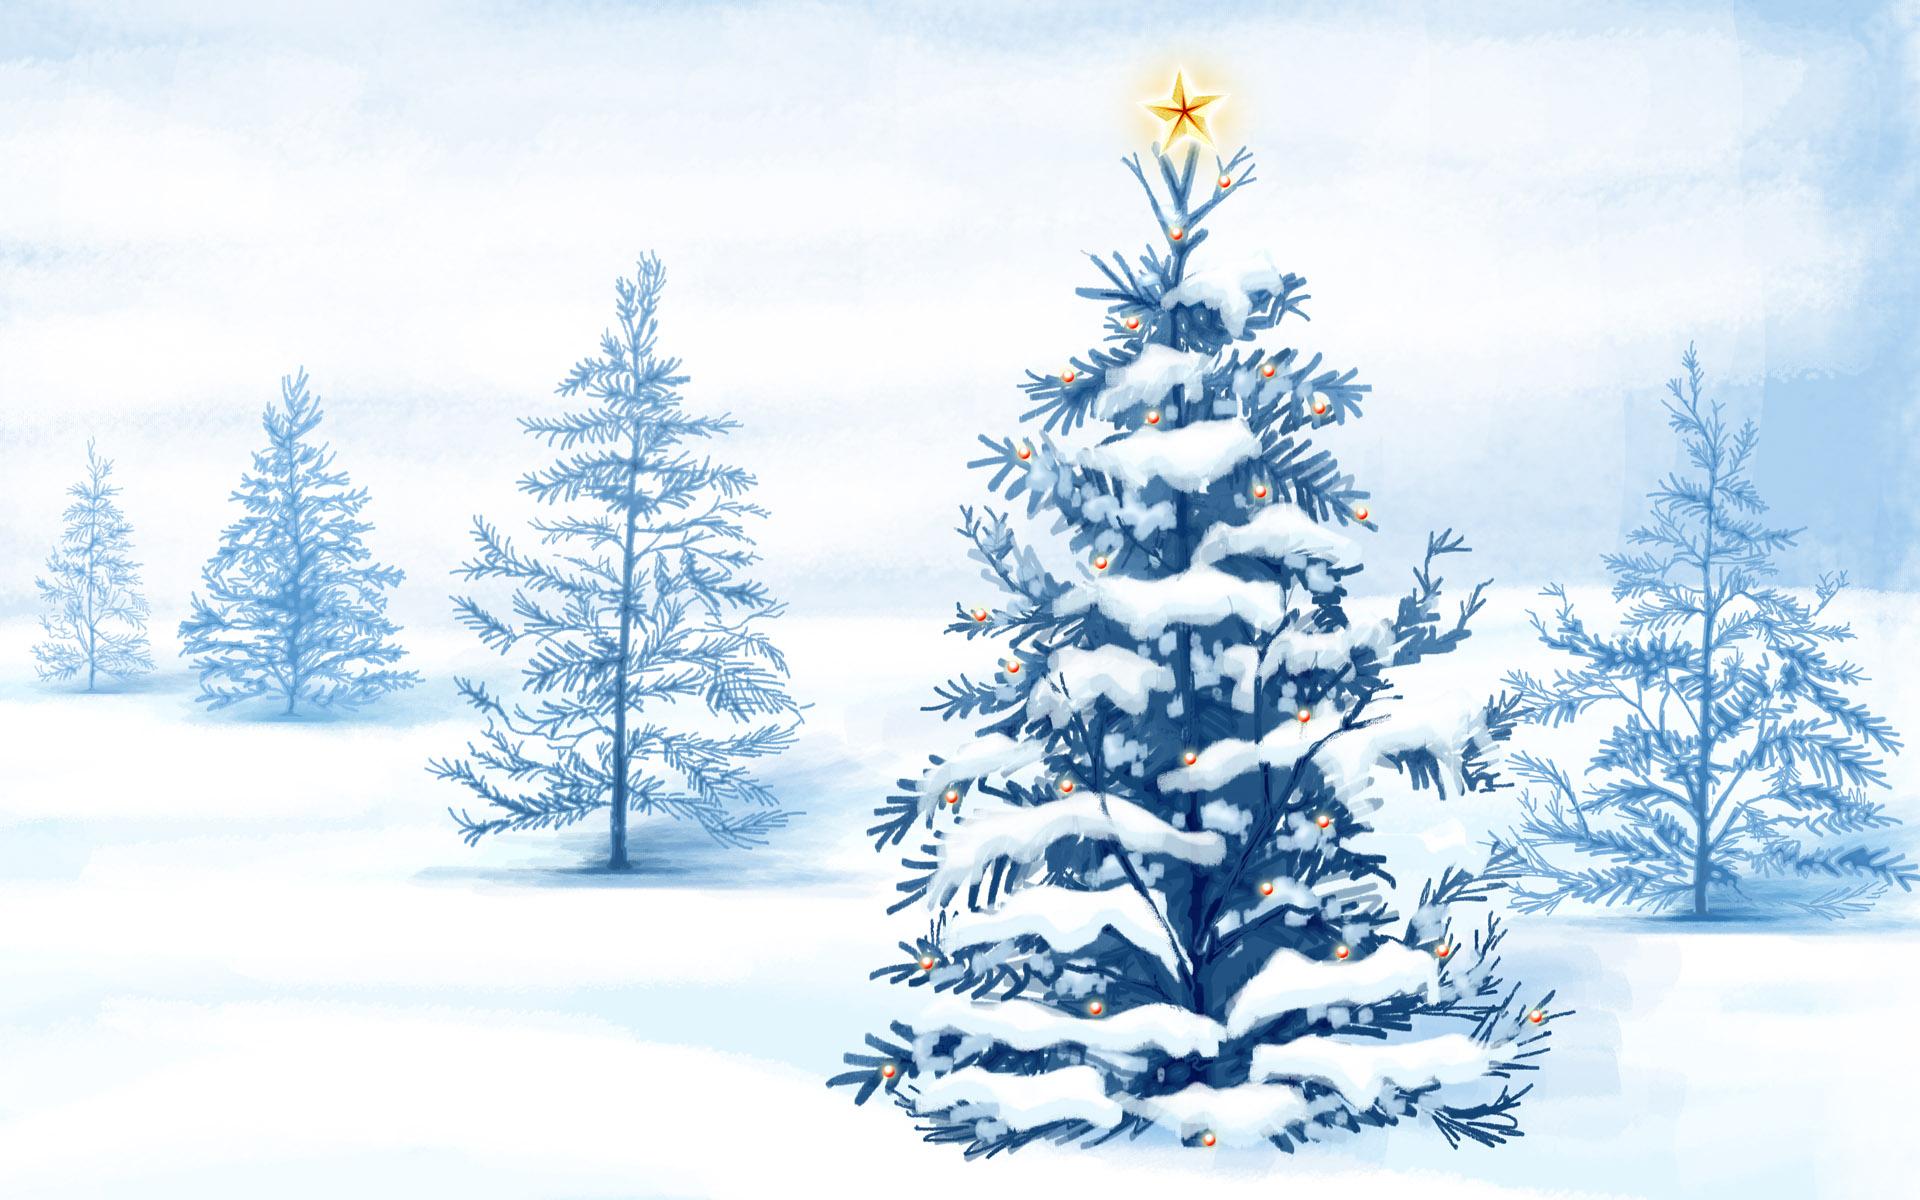 HD Wallpapers Christmas Snow Trees